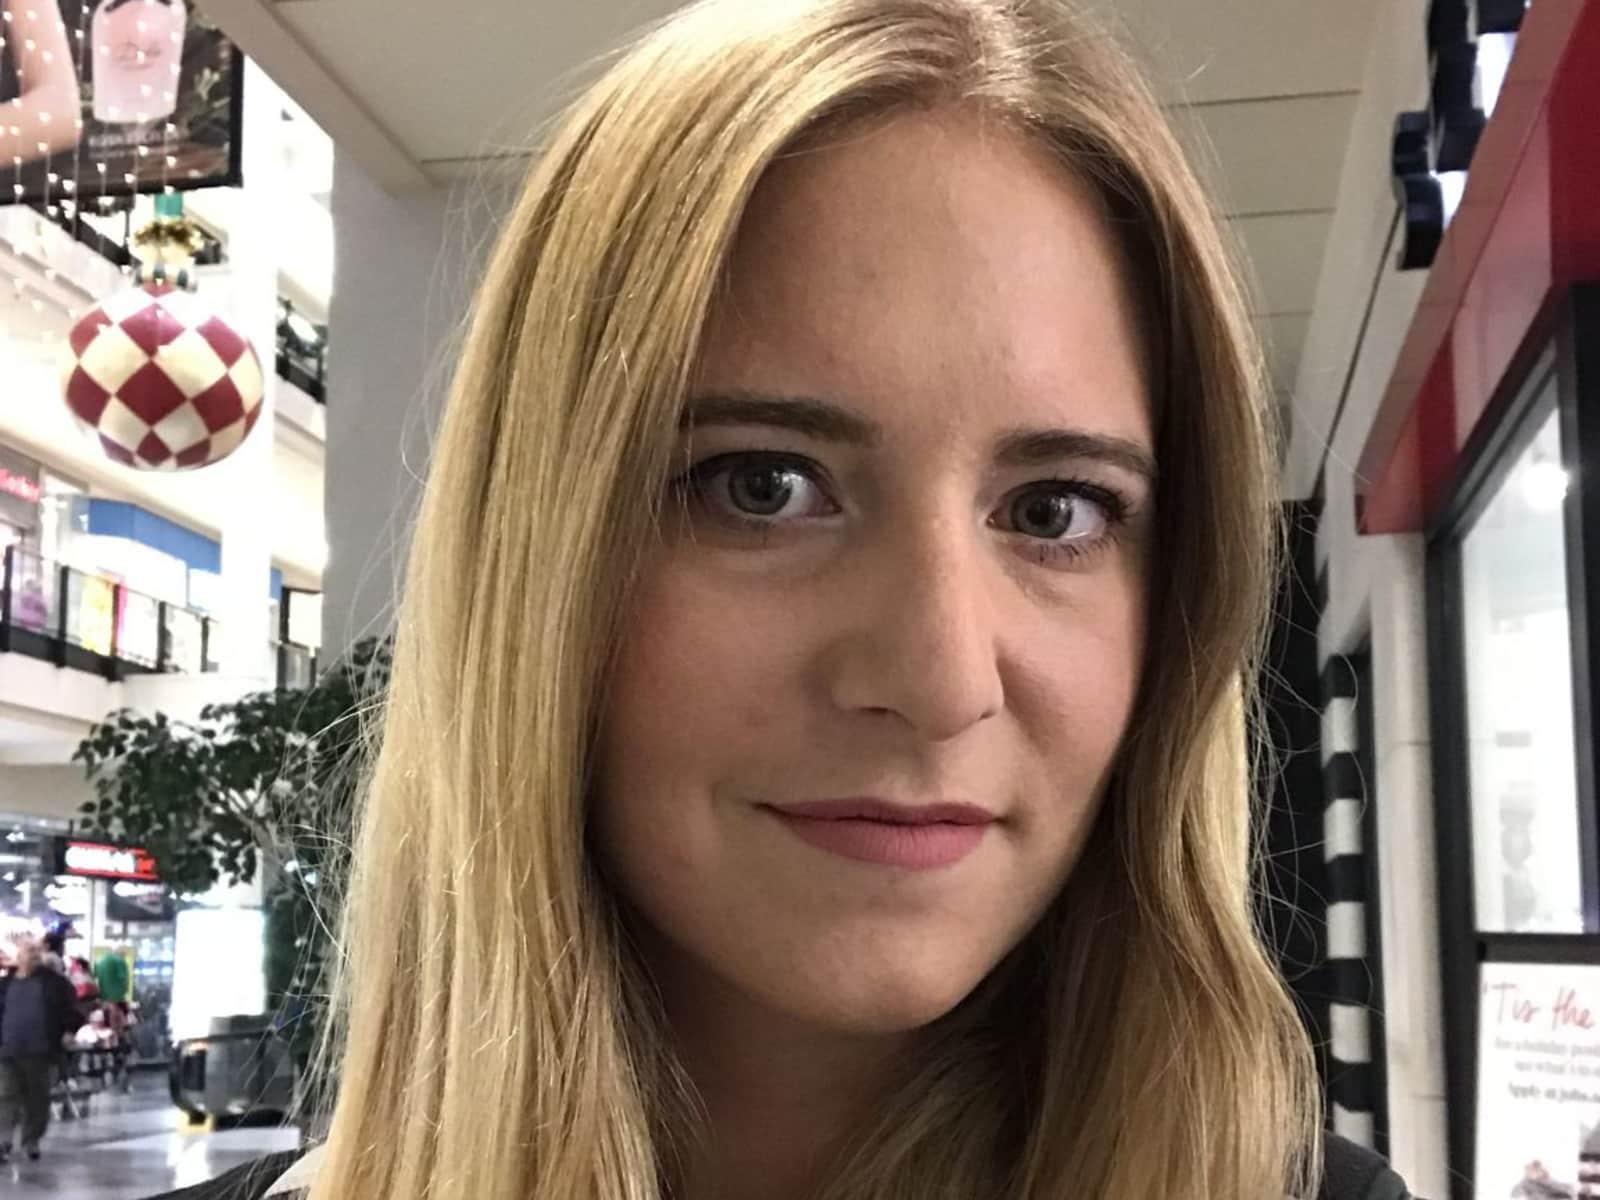 Aimée from Amsterdam, Netherlands